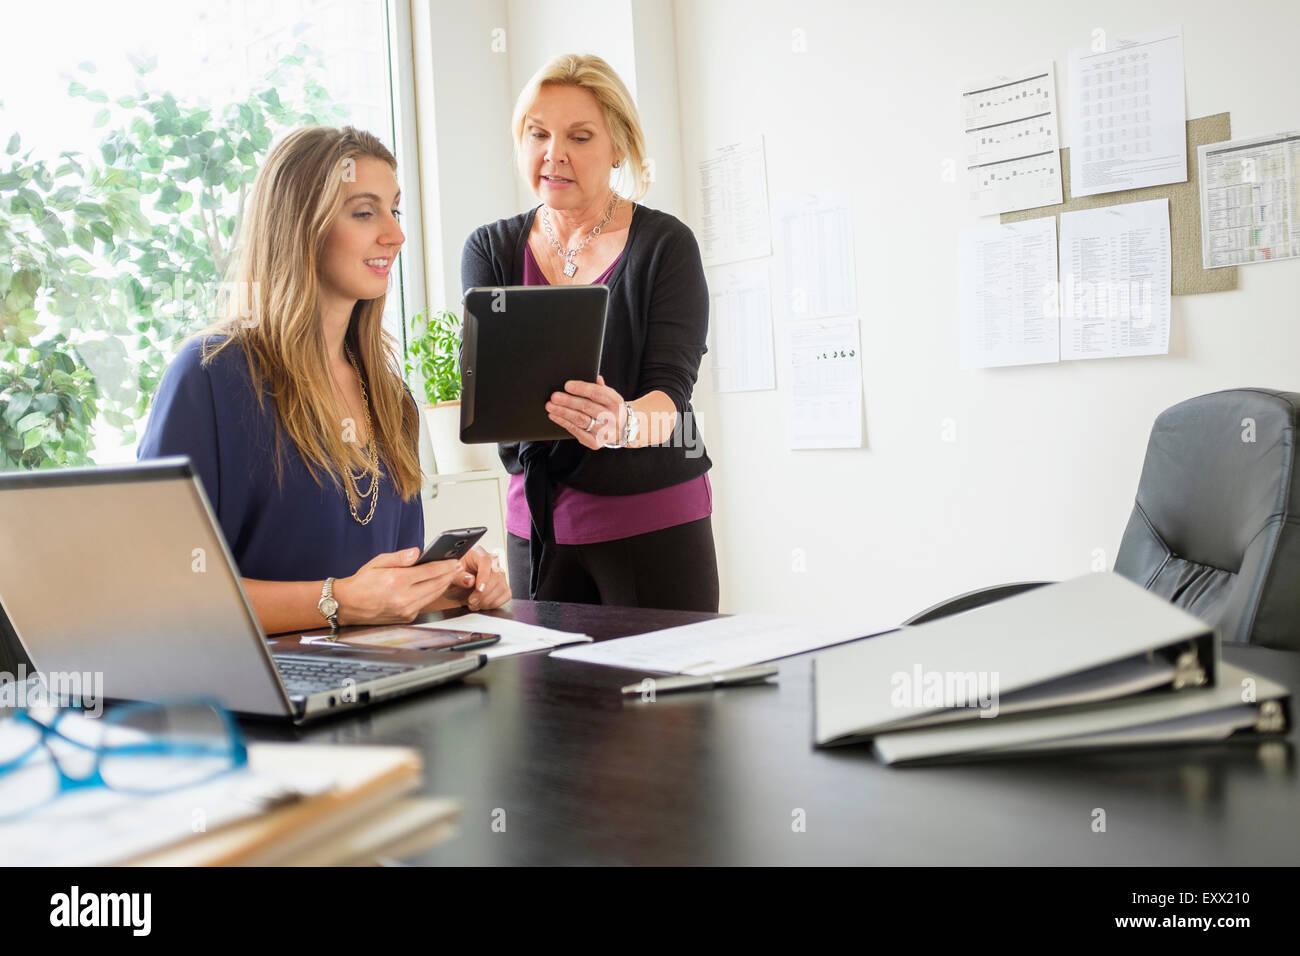 Two business women talking in office - Stock Image